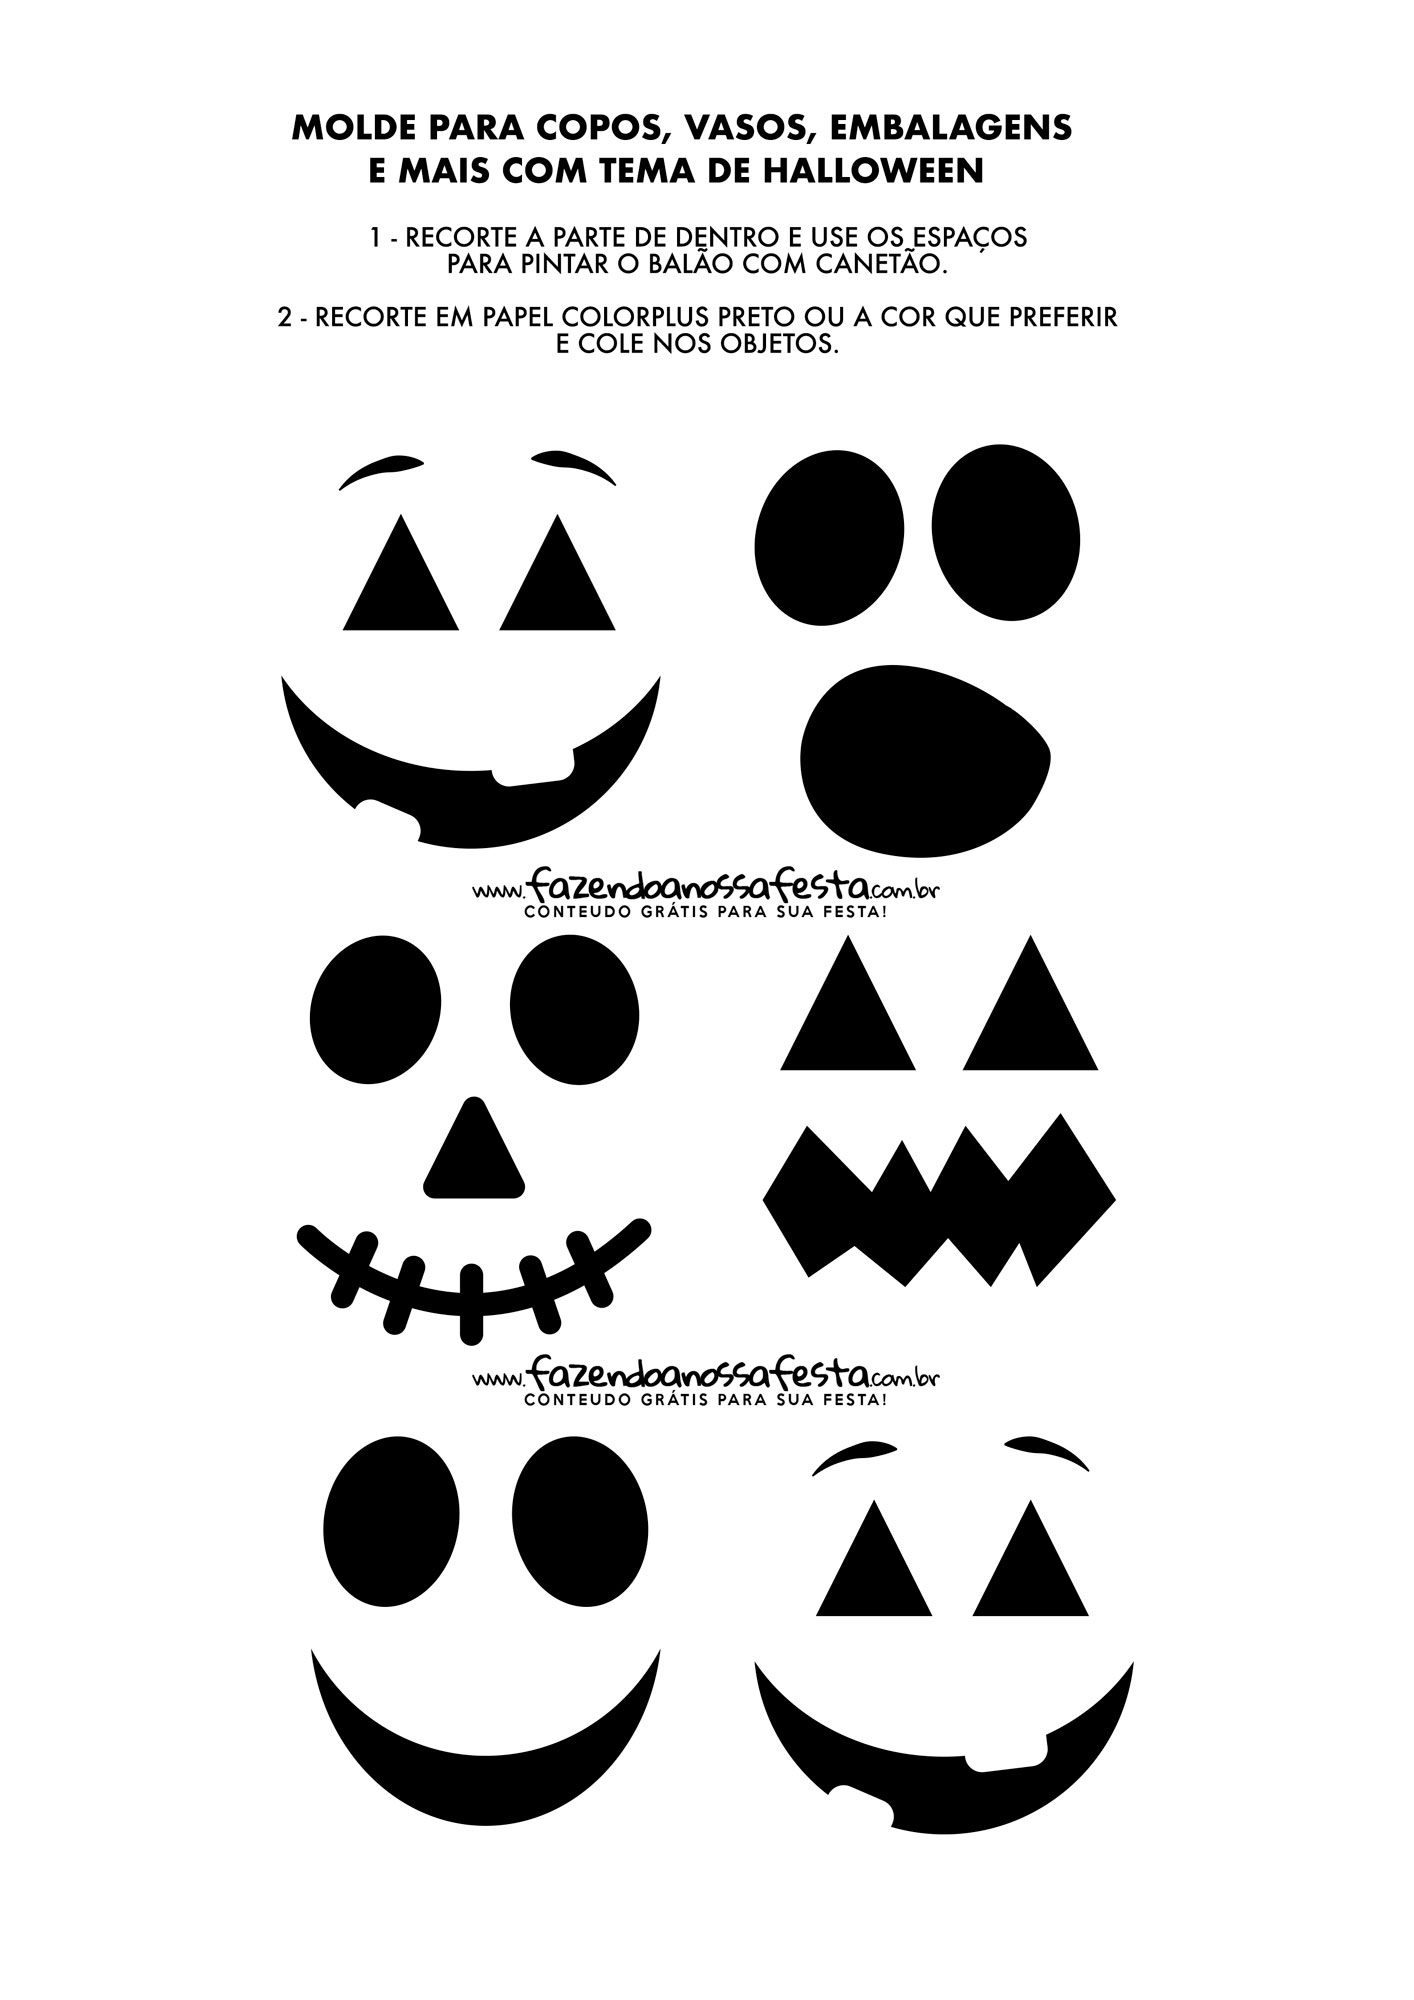 Moldes Para Halloween Molde Rostos Para Copo Potes Embalagens